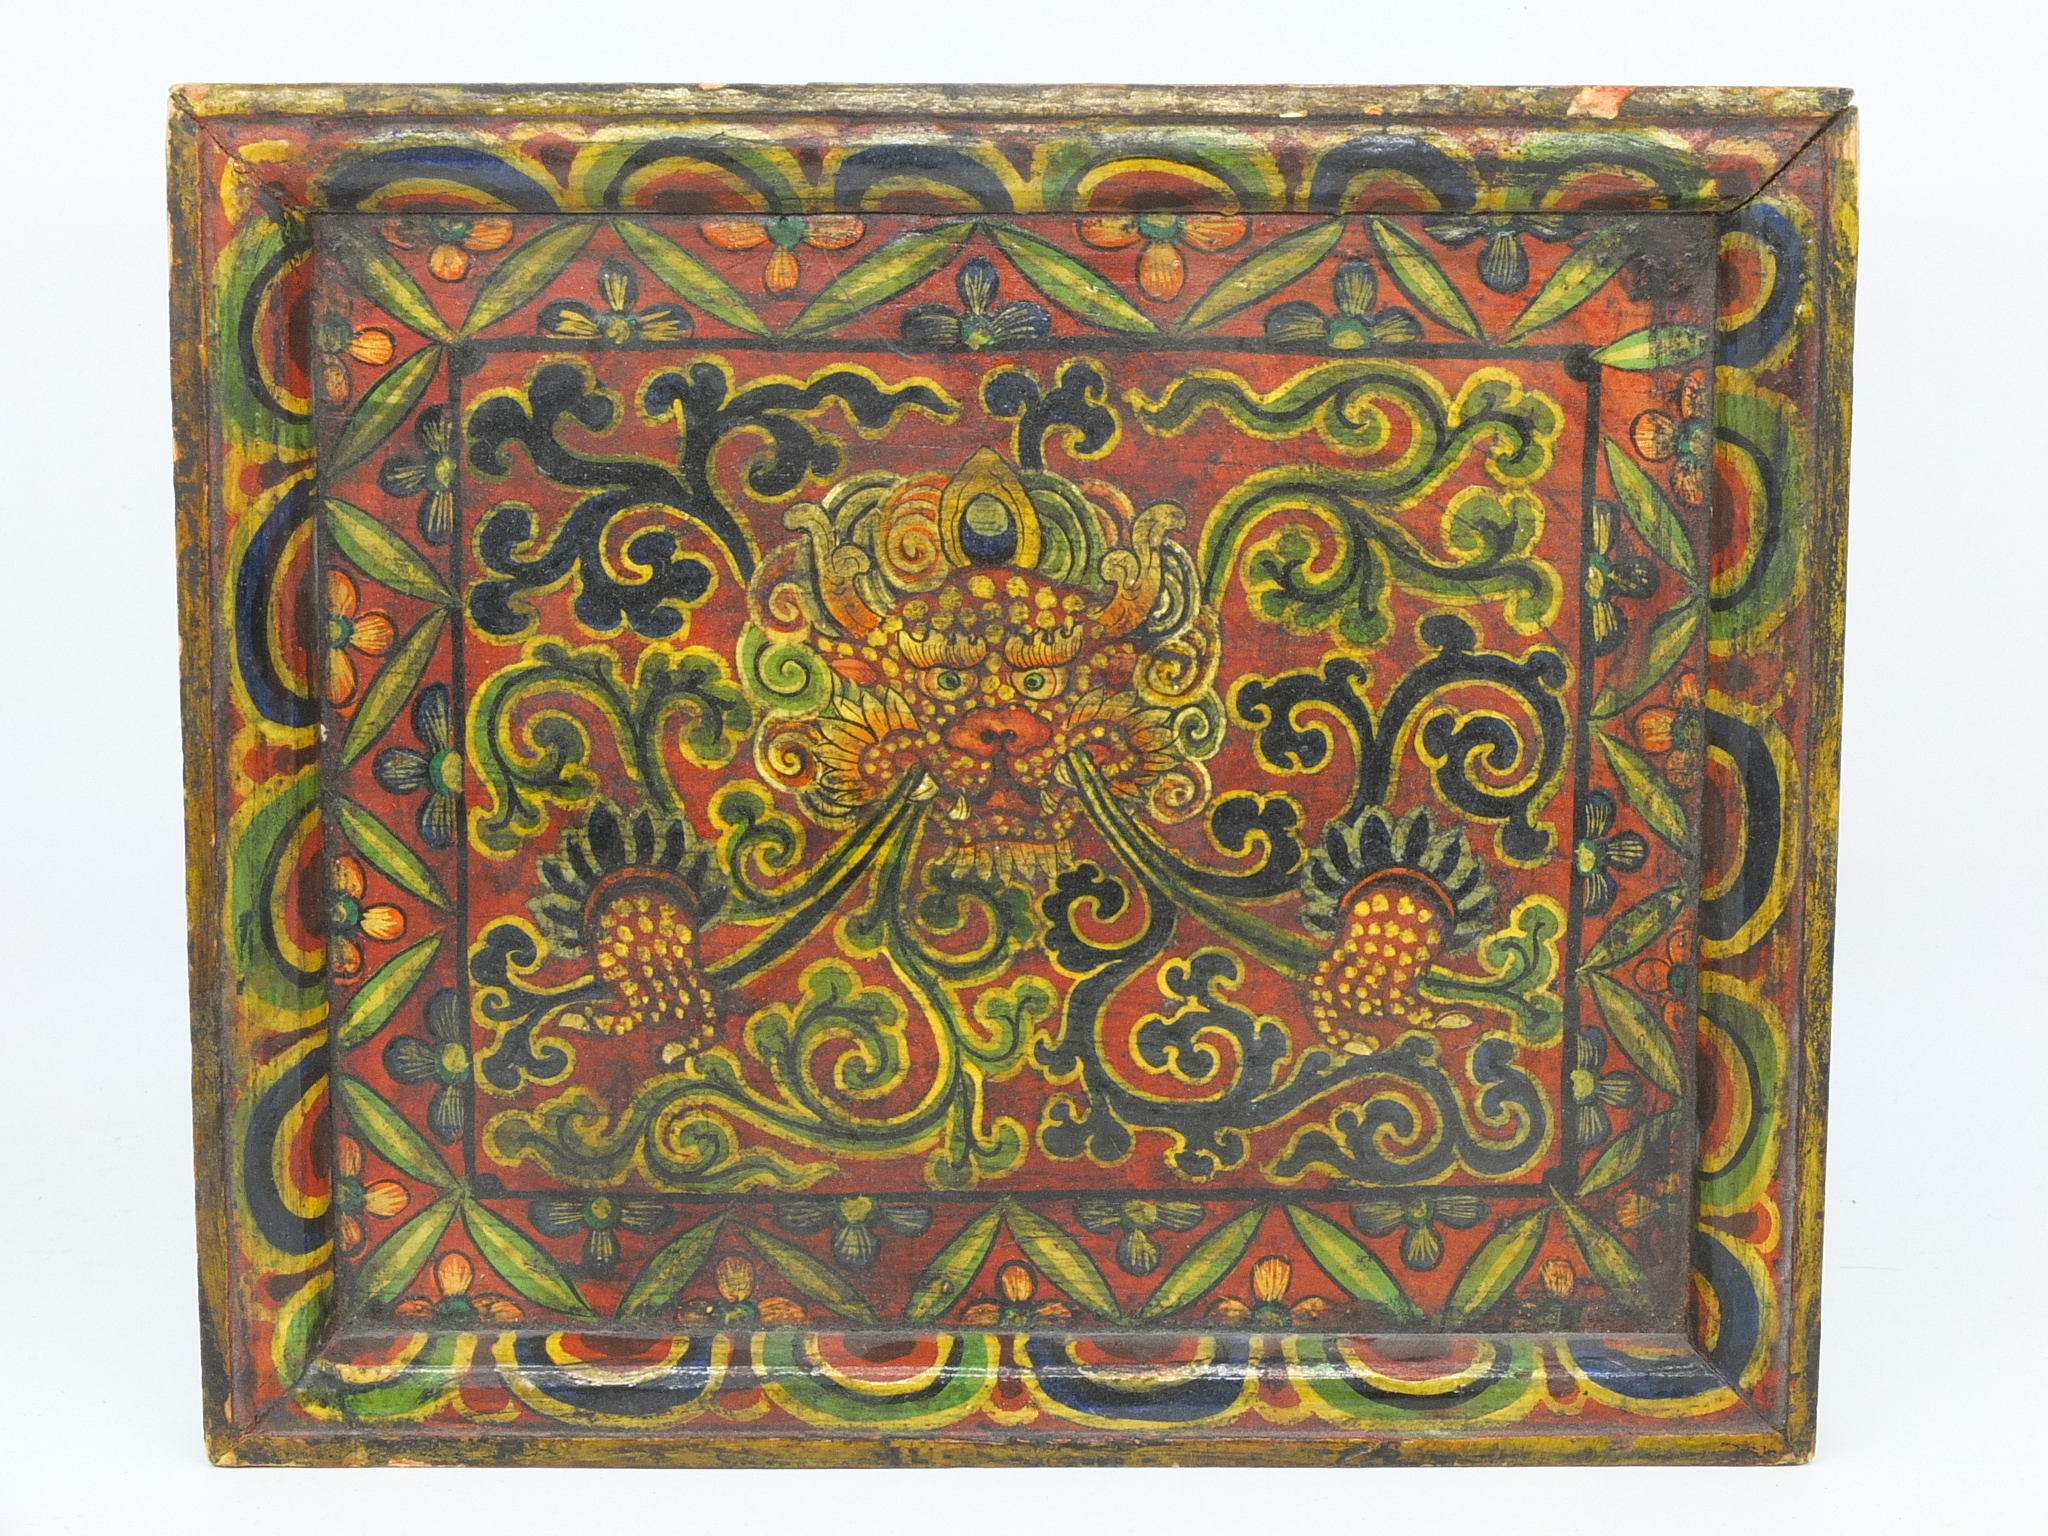 'Vintage Tibetan Hand Painted Panel'